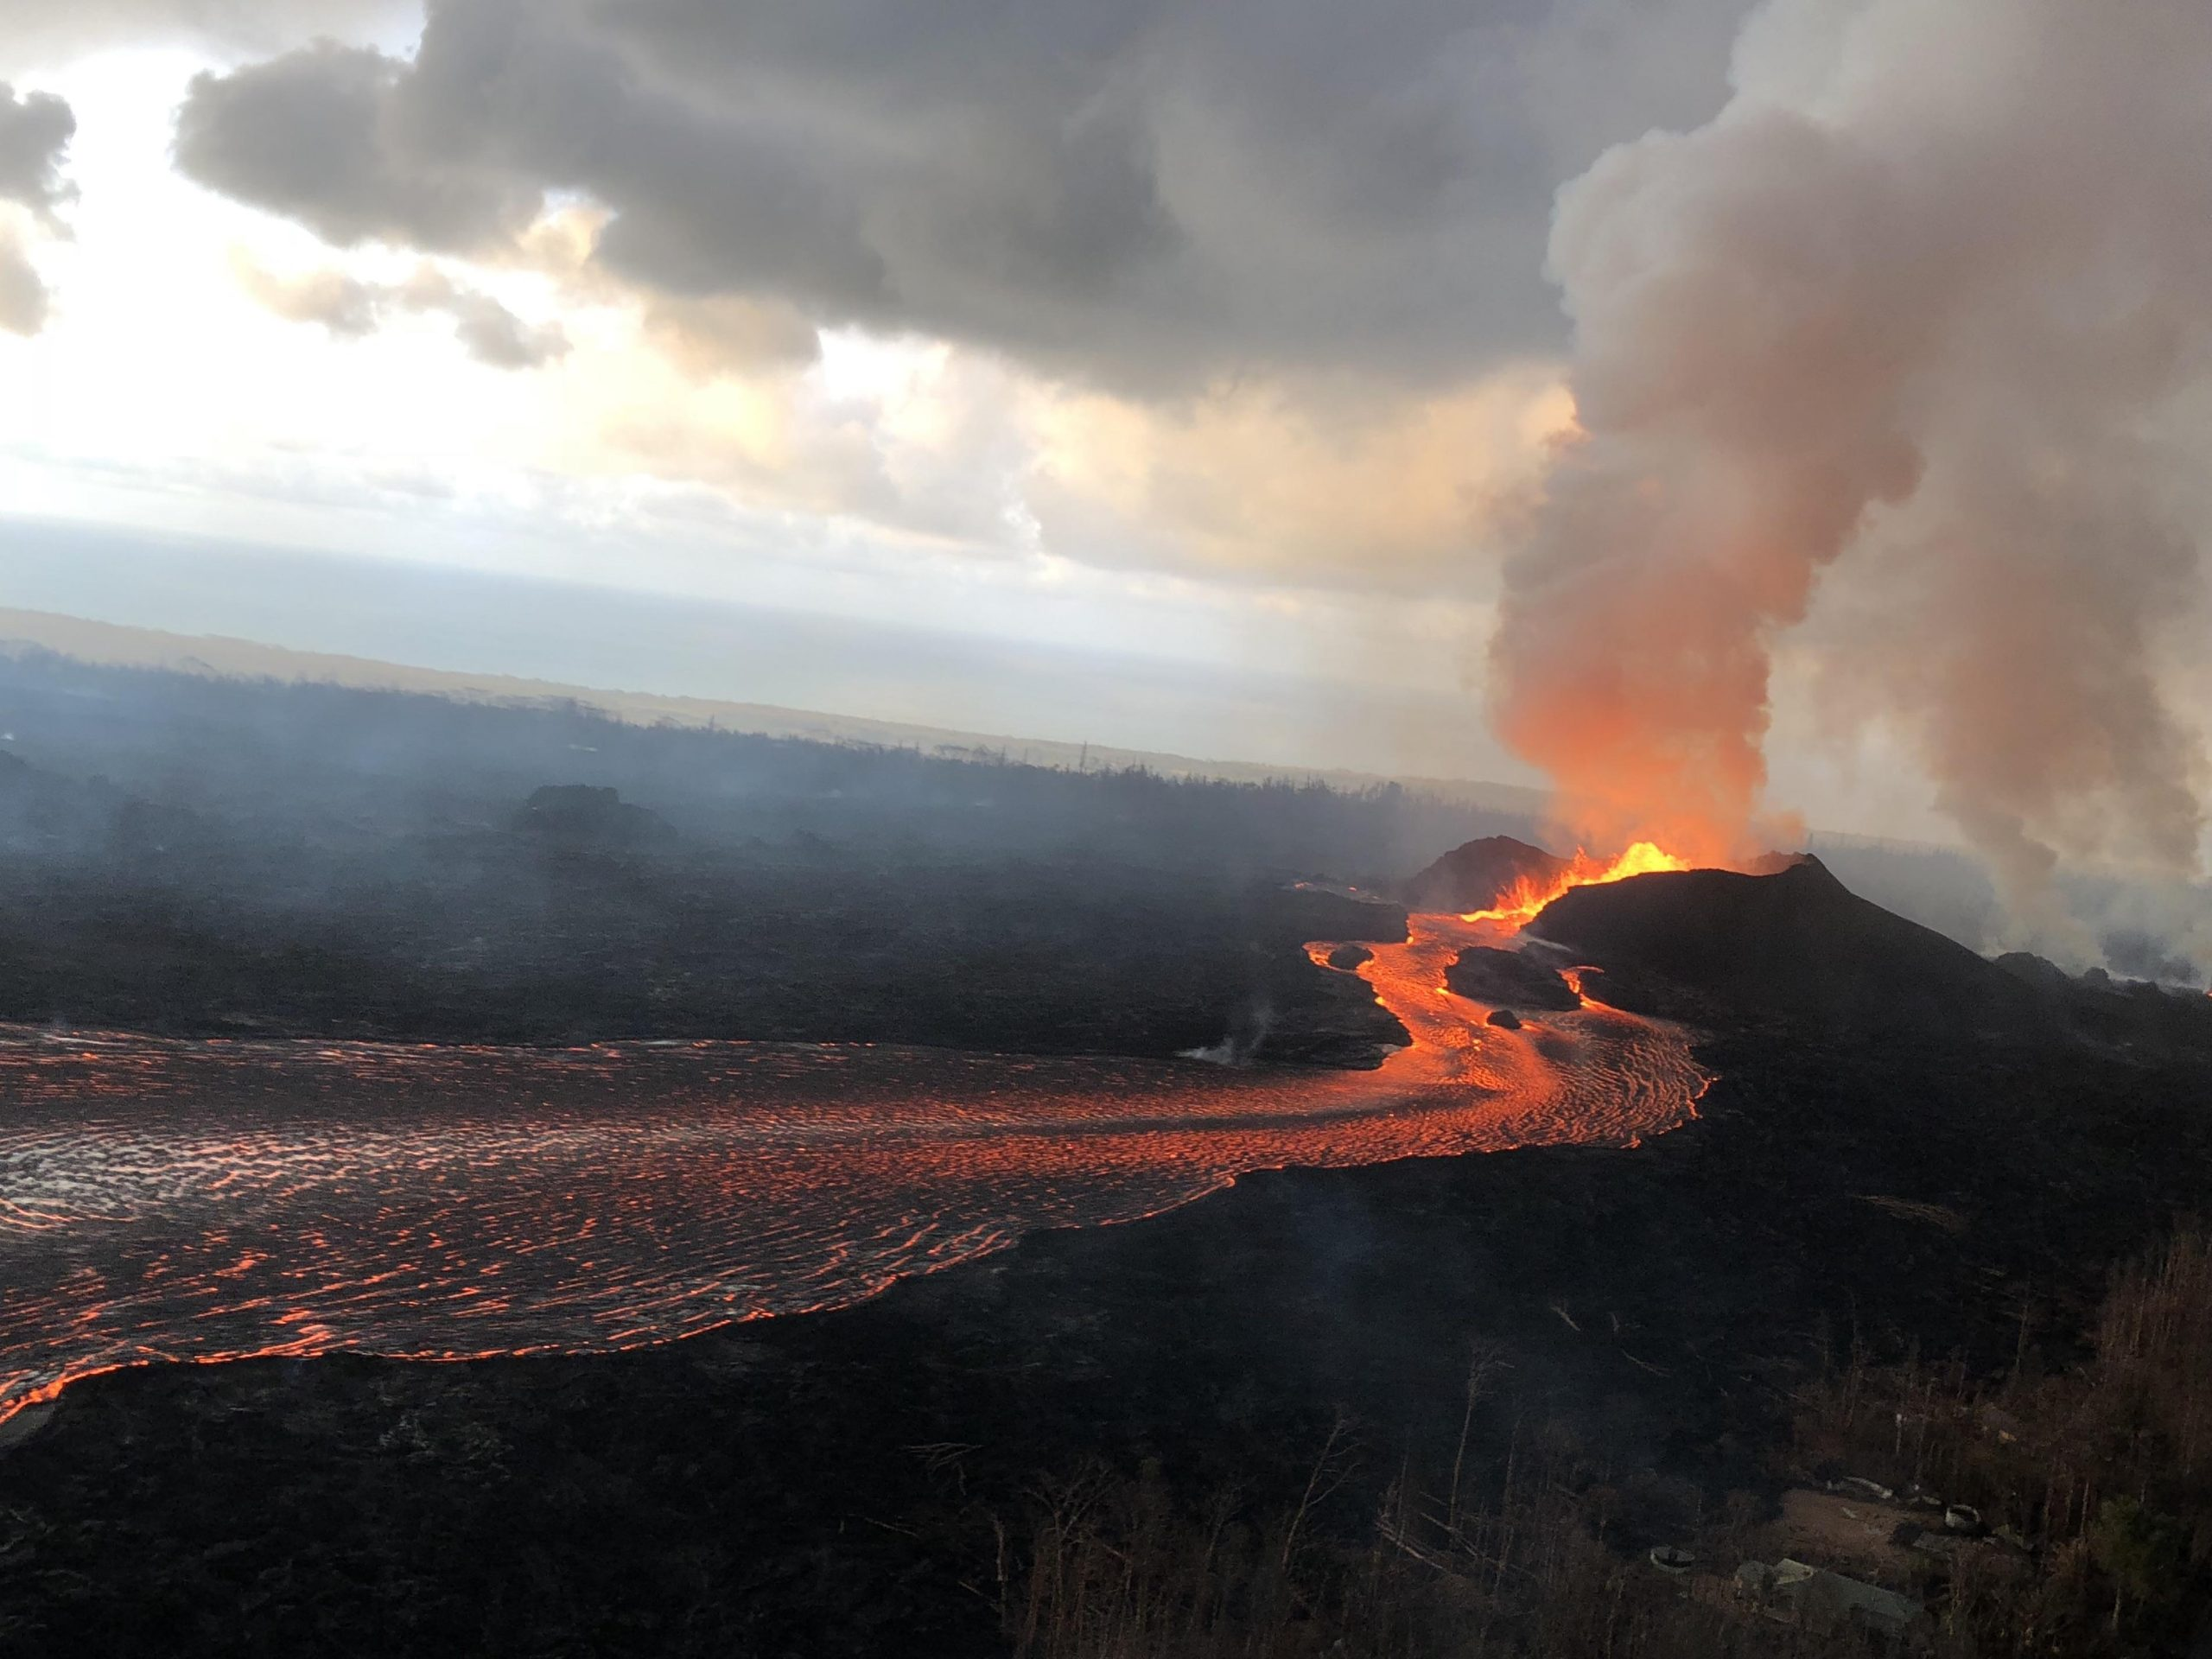 Study: 2018 Kīlauea Volcano Eruption Triggered by Decade-Long Pressure Buildup